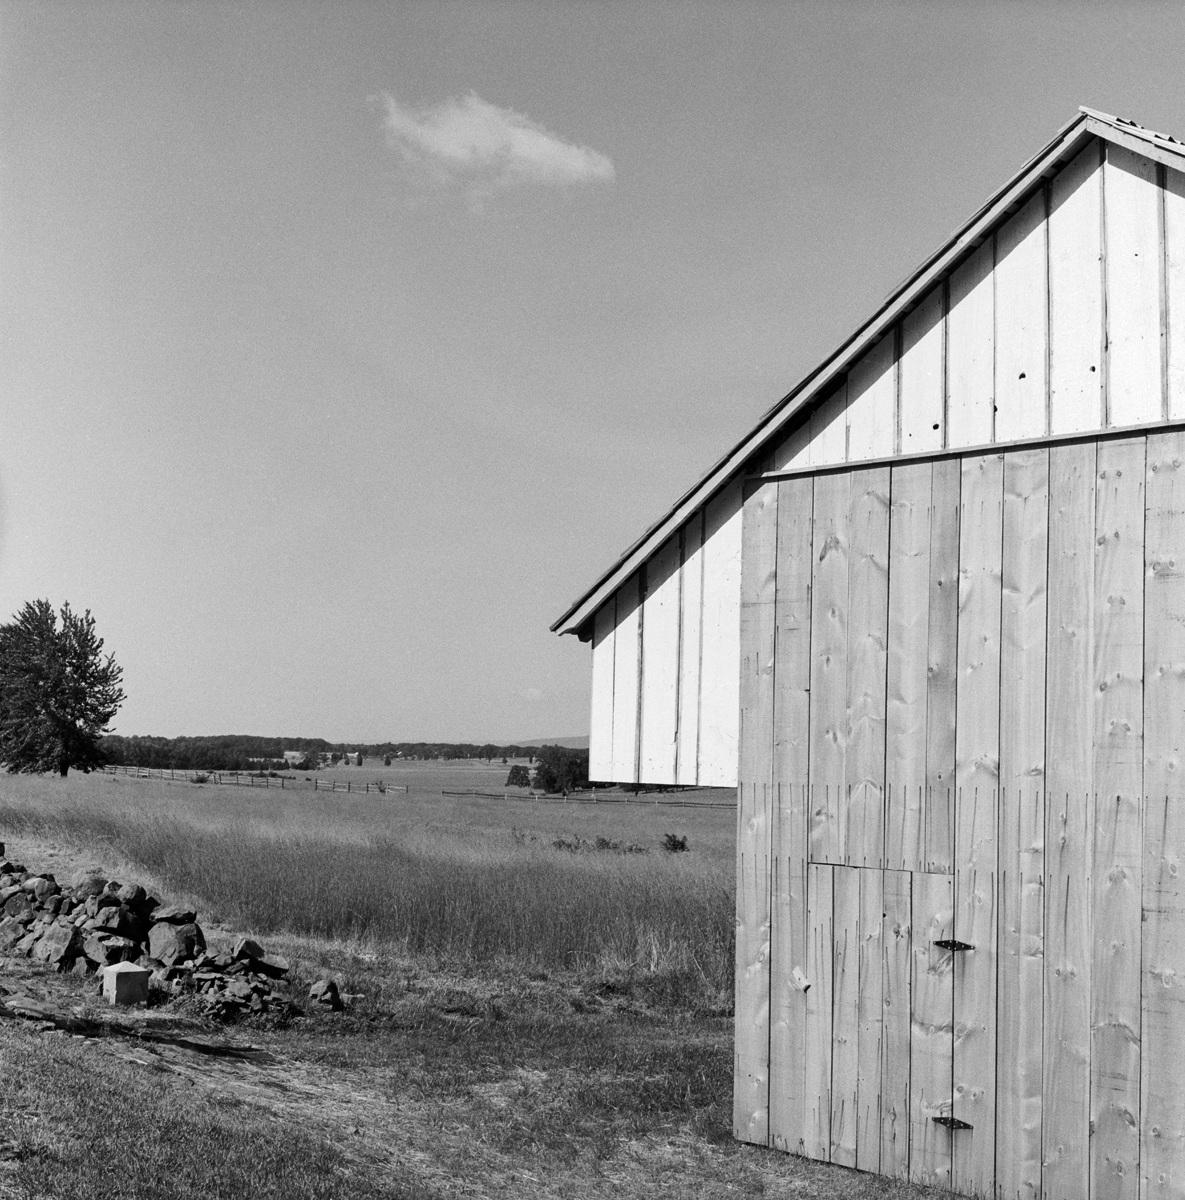 Abraham Brian Barn, Gettysburg National Military Park, Gettysburg, PA 1986